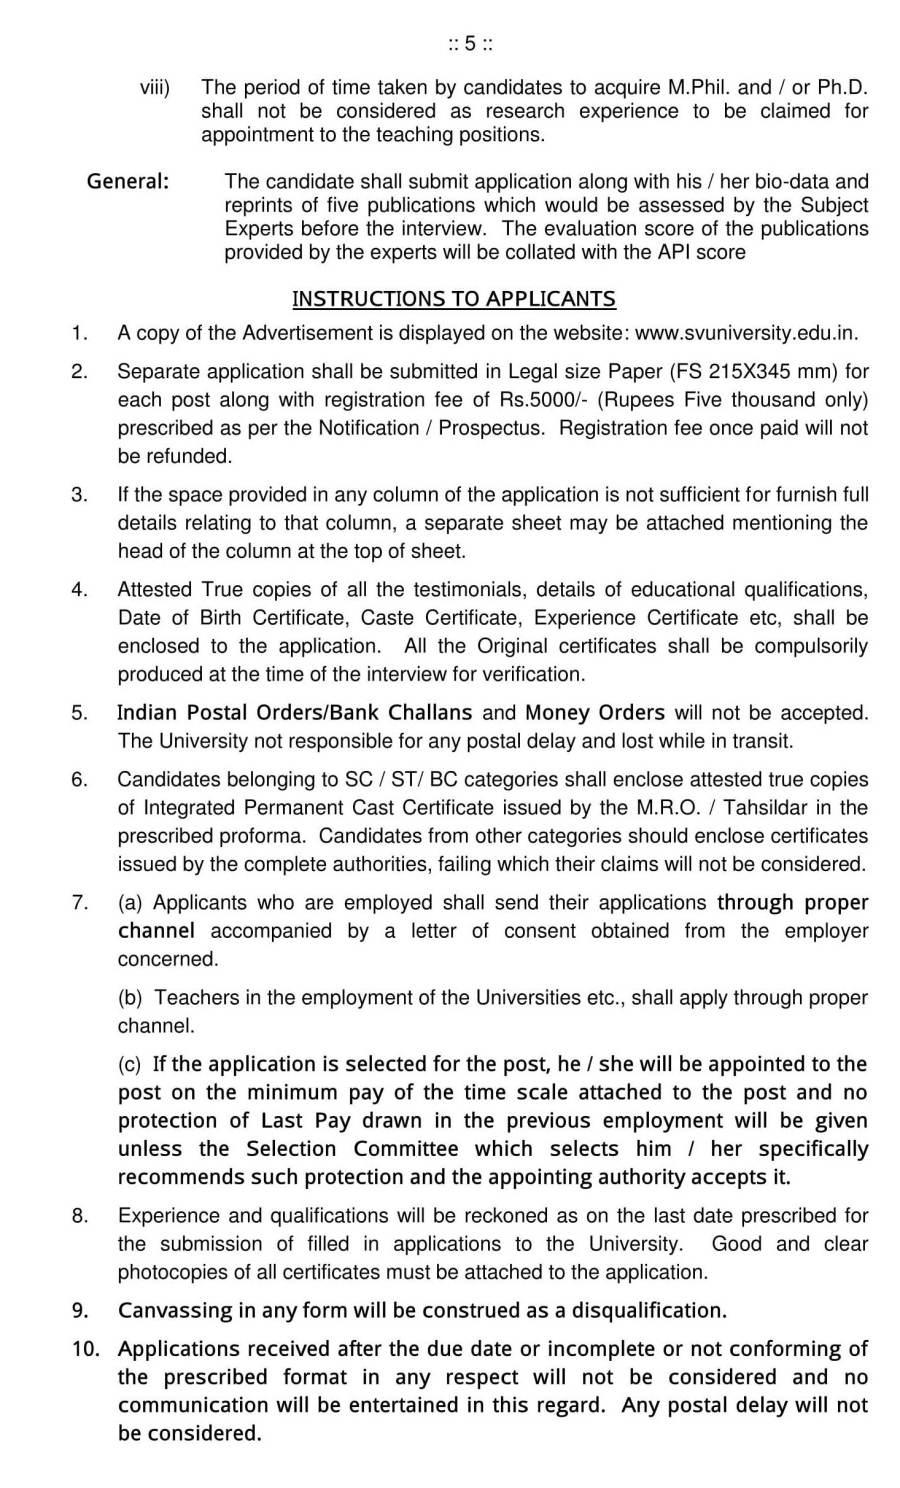 20171224111251515_Notification-for-recruitment-of-Associate-Professor-Posts-2017_3-5.jpg